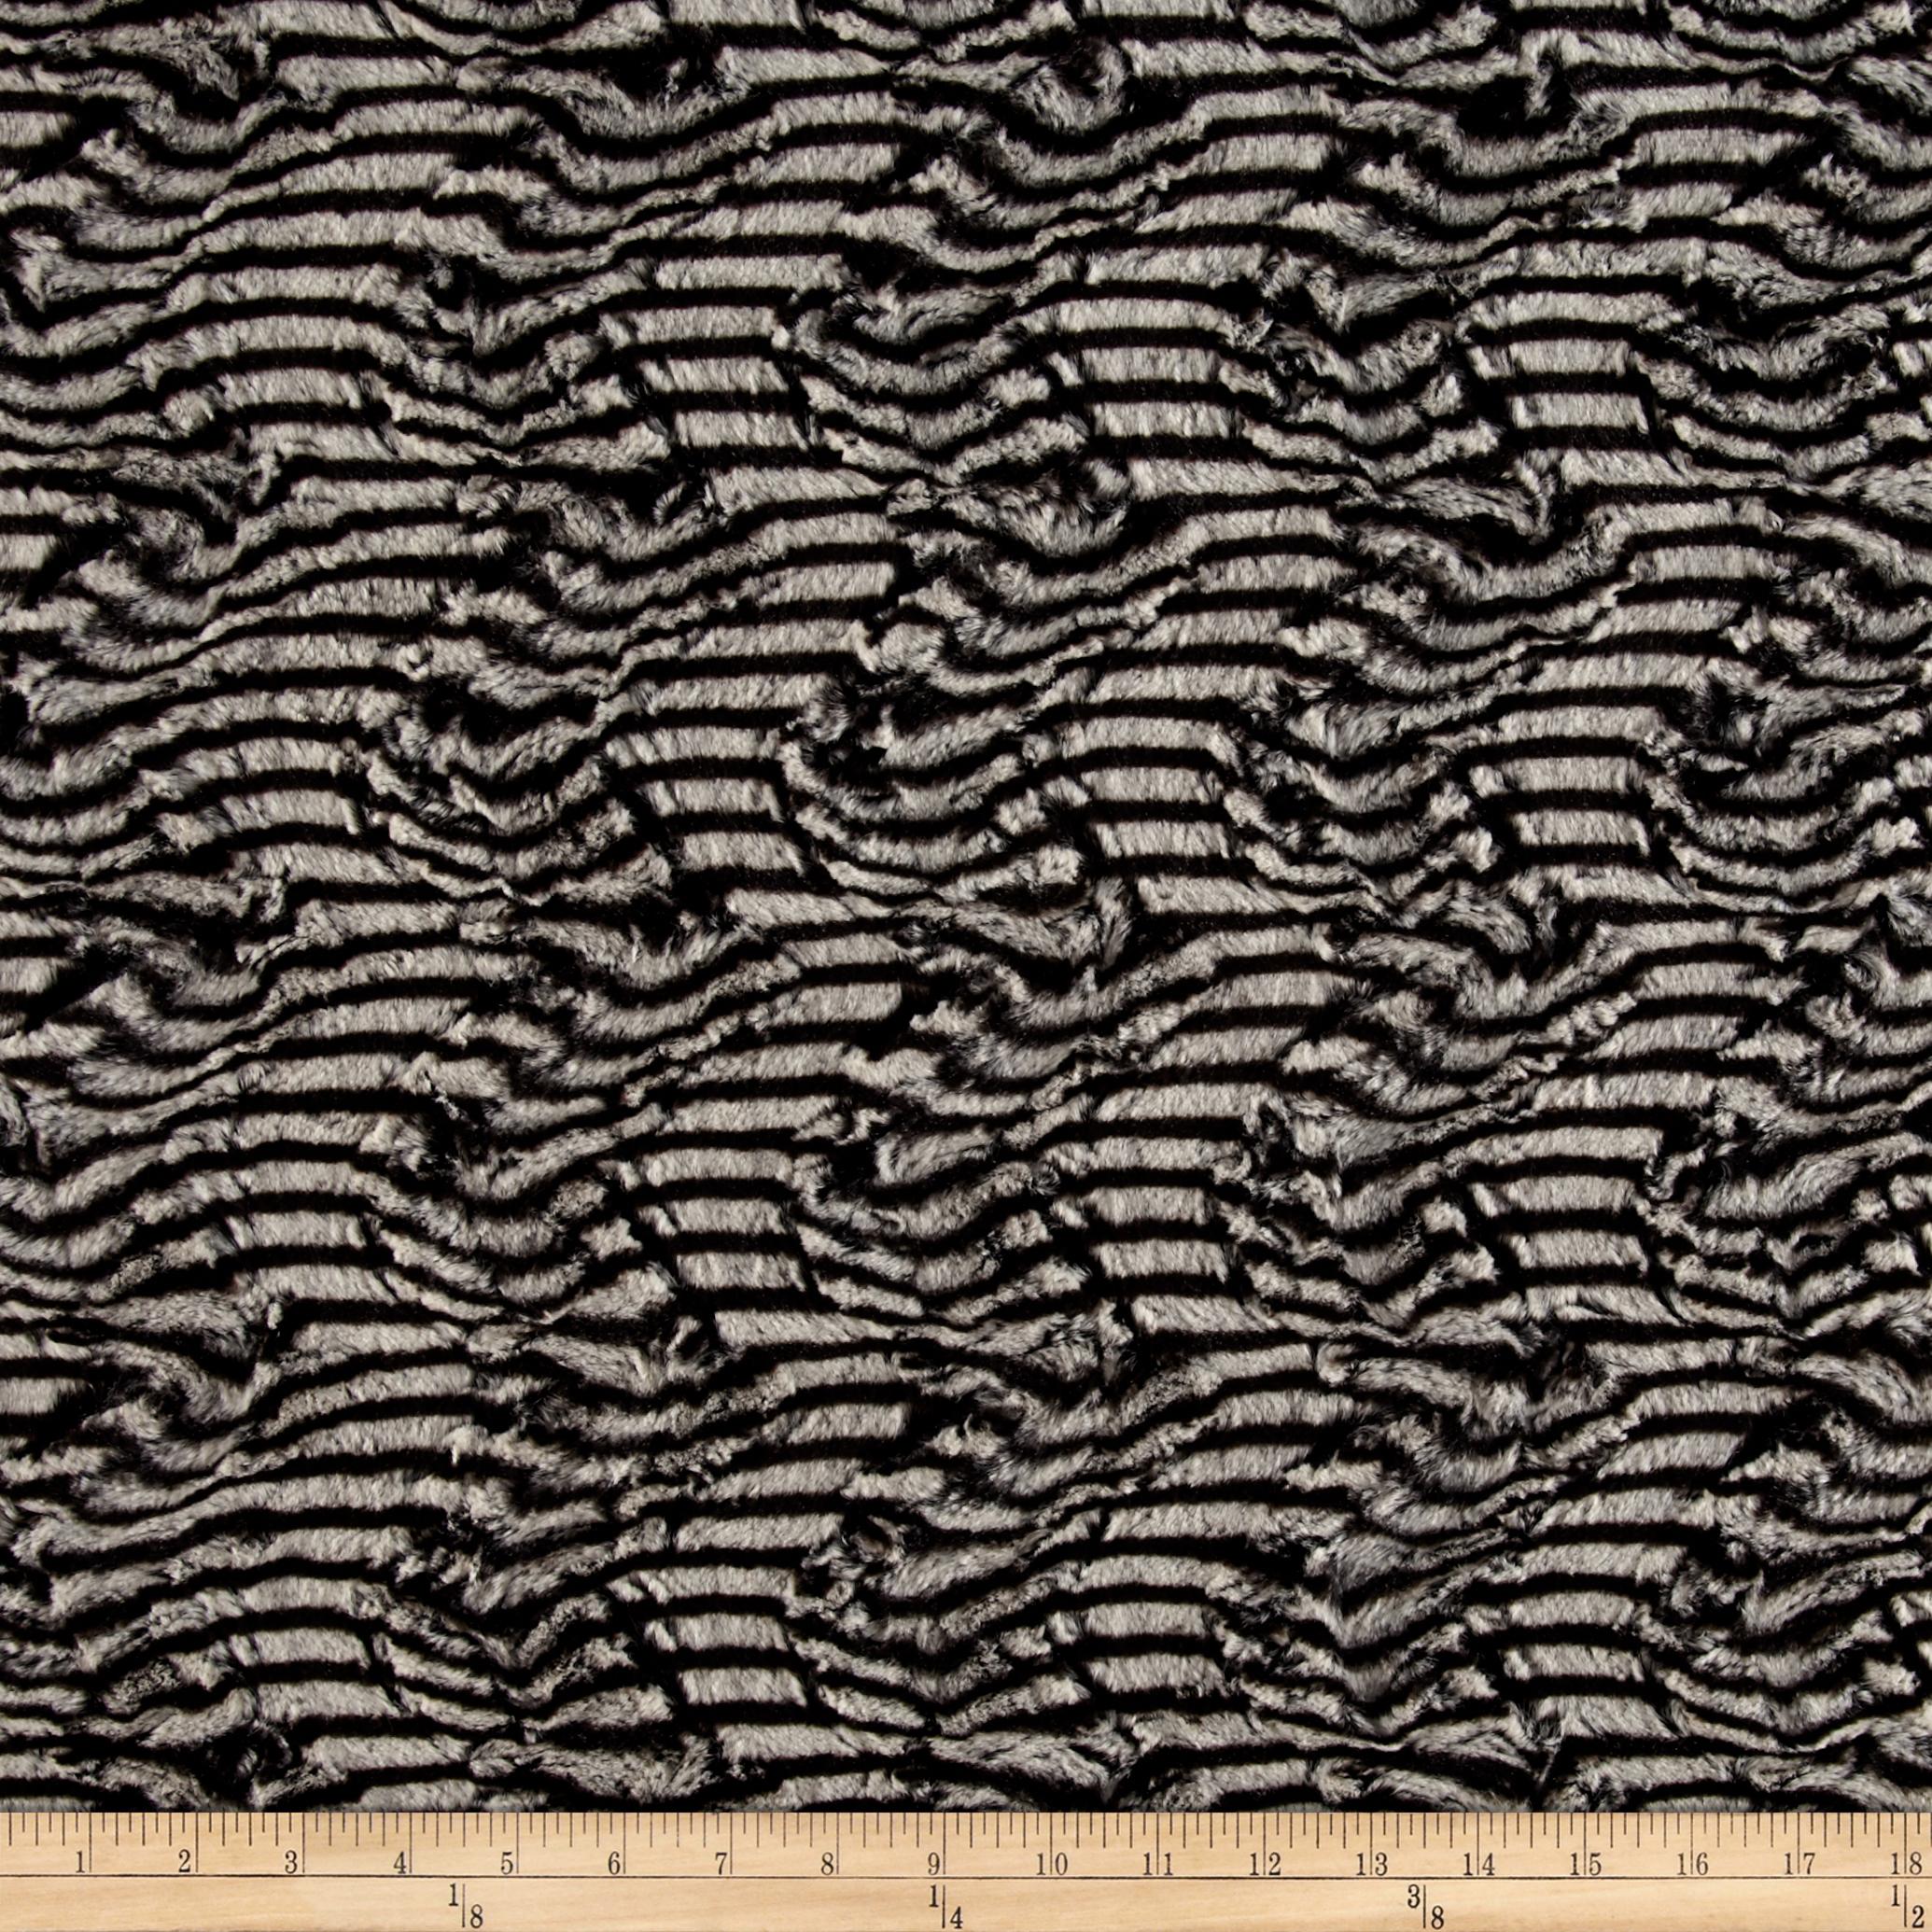 Minky Soft Cuddle Plume Beige/Black Fabric